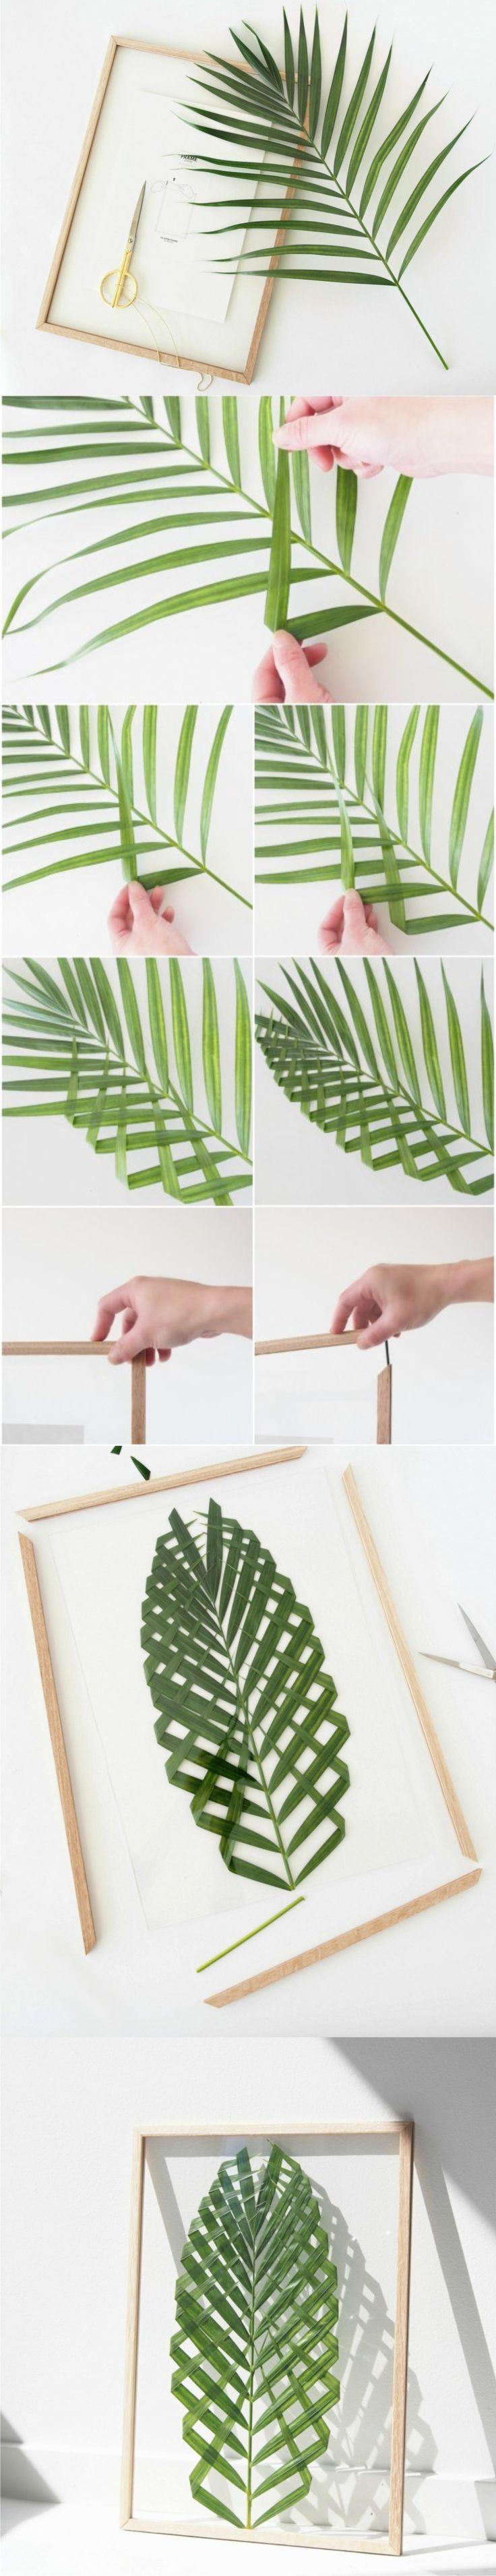 cuadro-DIY-hoja-palma-muy-ingenioso-2.jpg 1.006×5.224 pixel